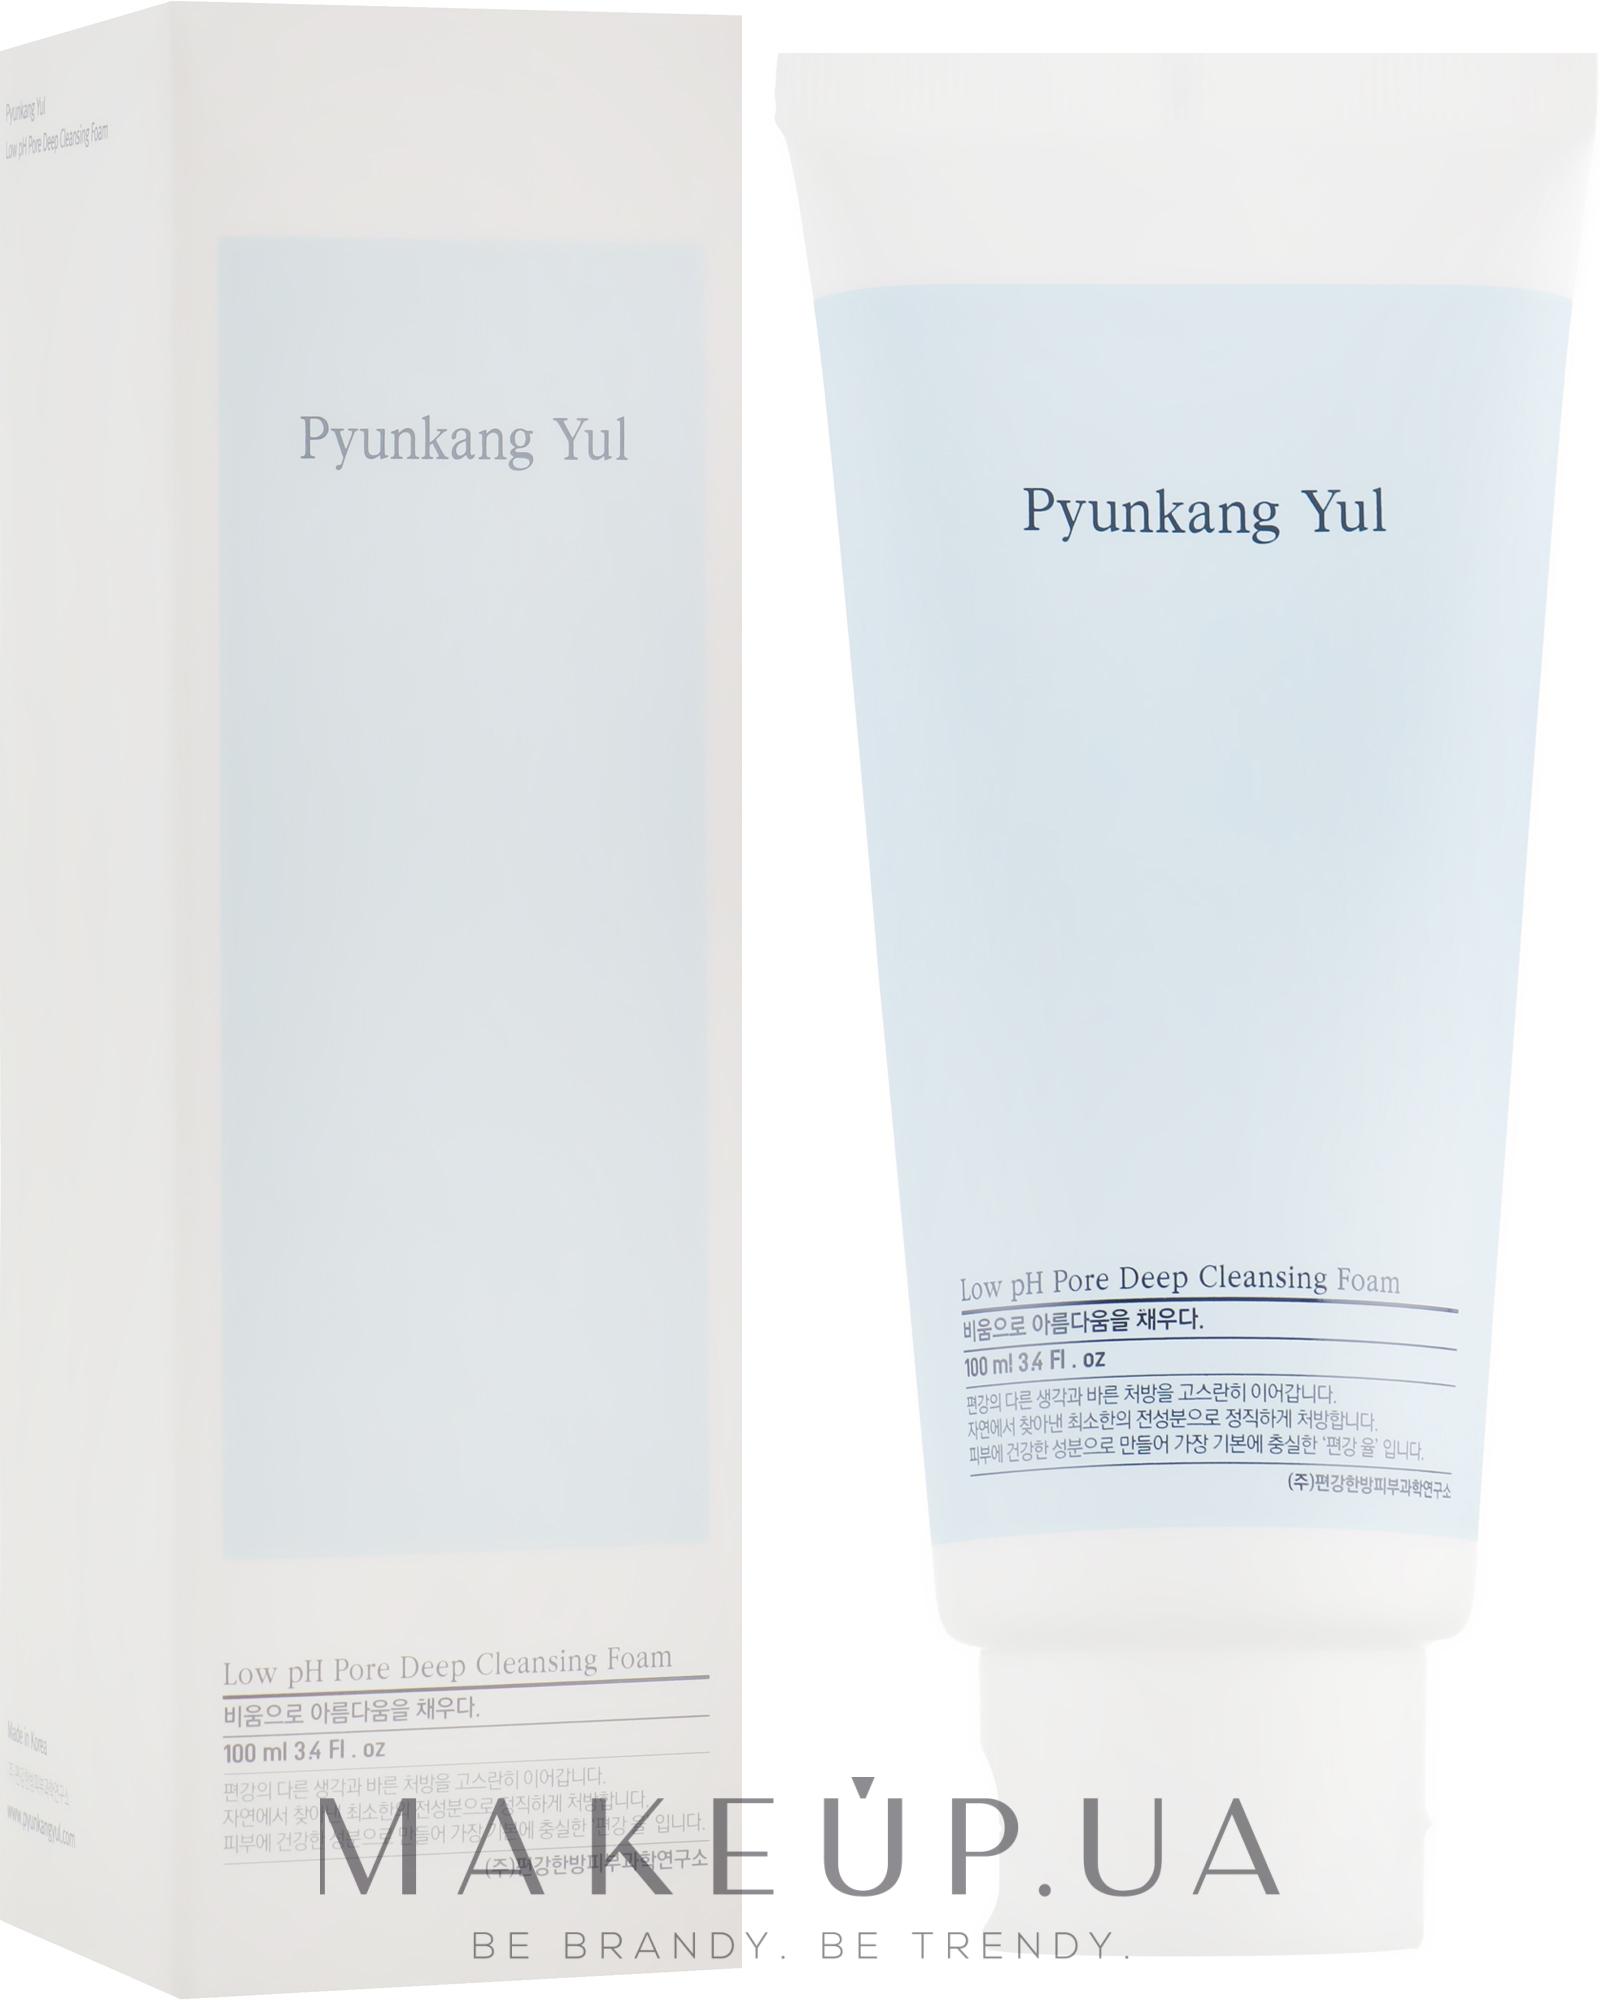 Глубоко очищающая пенка с низким pH - Pyunkang Yul Pore Deep Cleansing Foam — фото 100ml